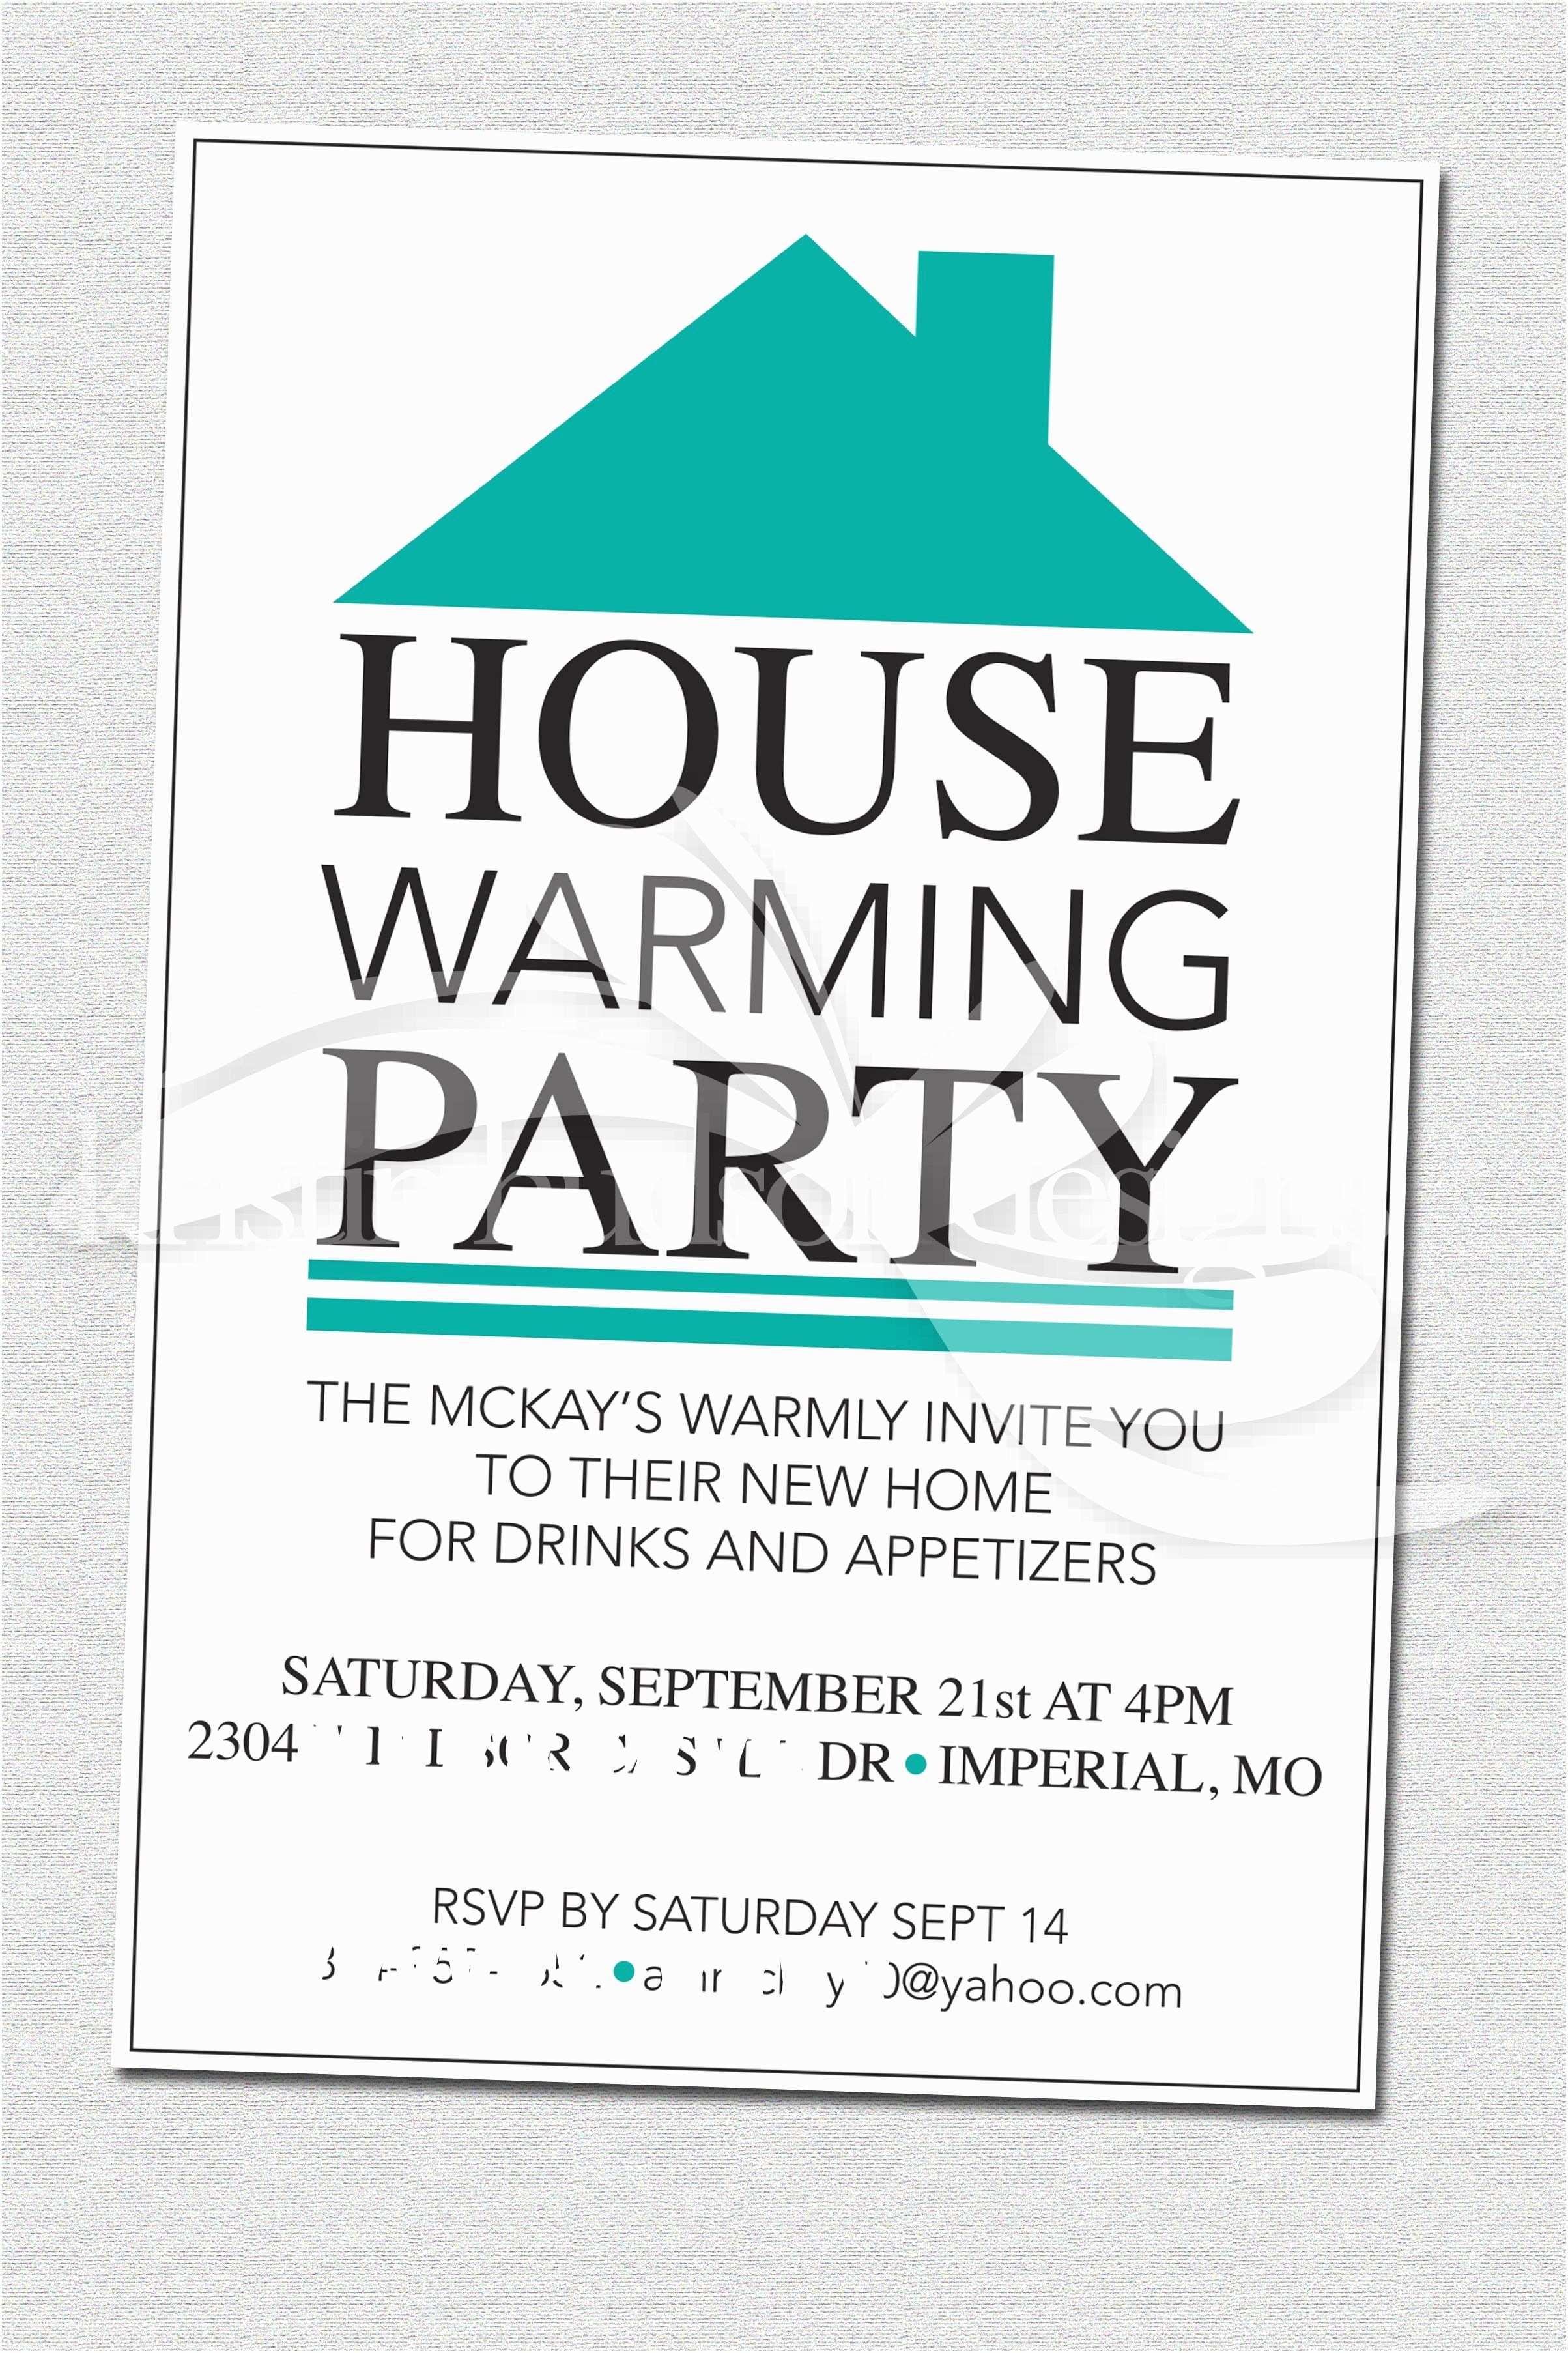 /housewarming/free Housewarming Invitations House Warming Party Invite